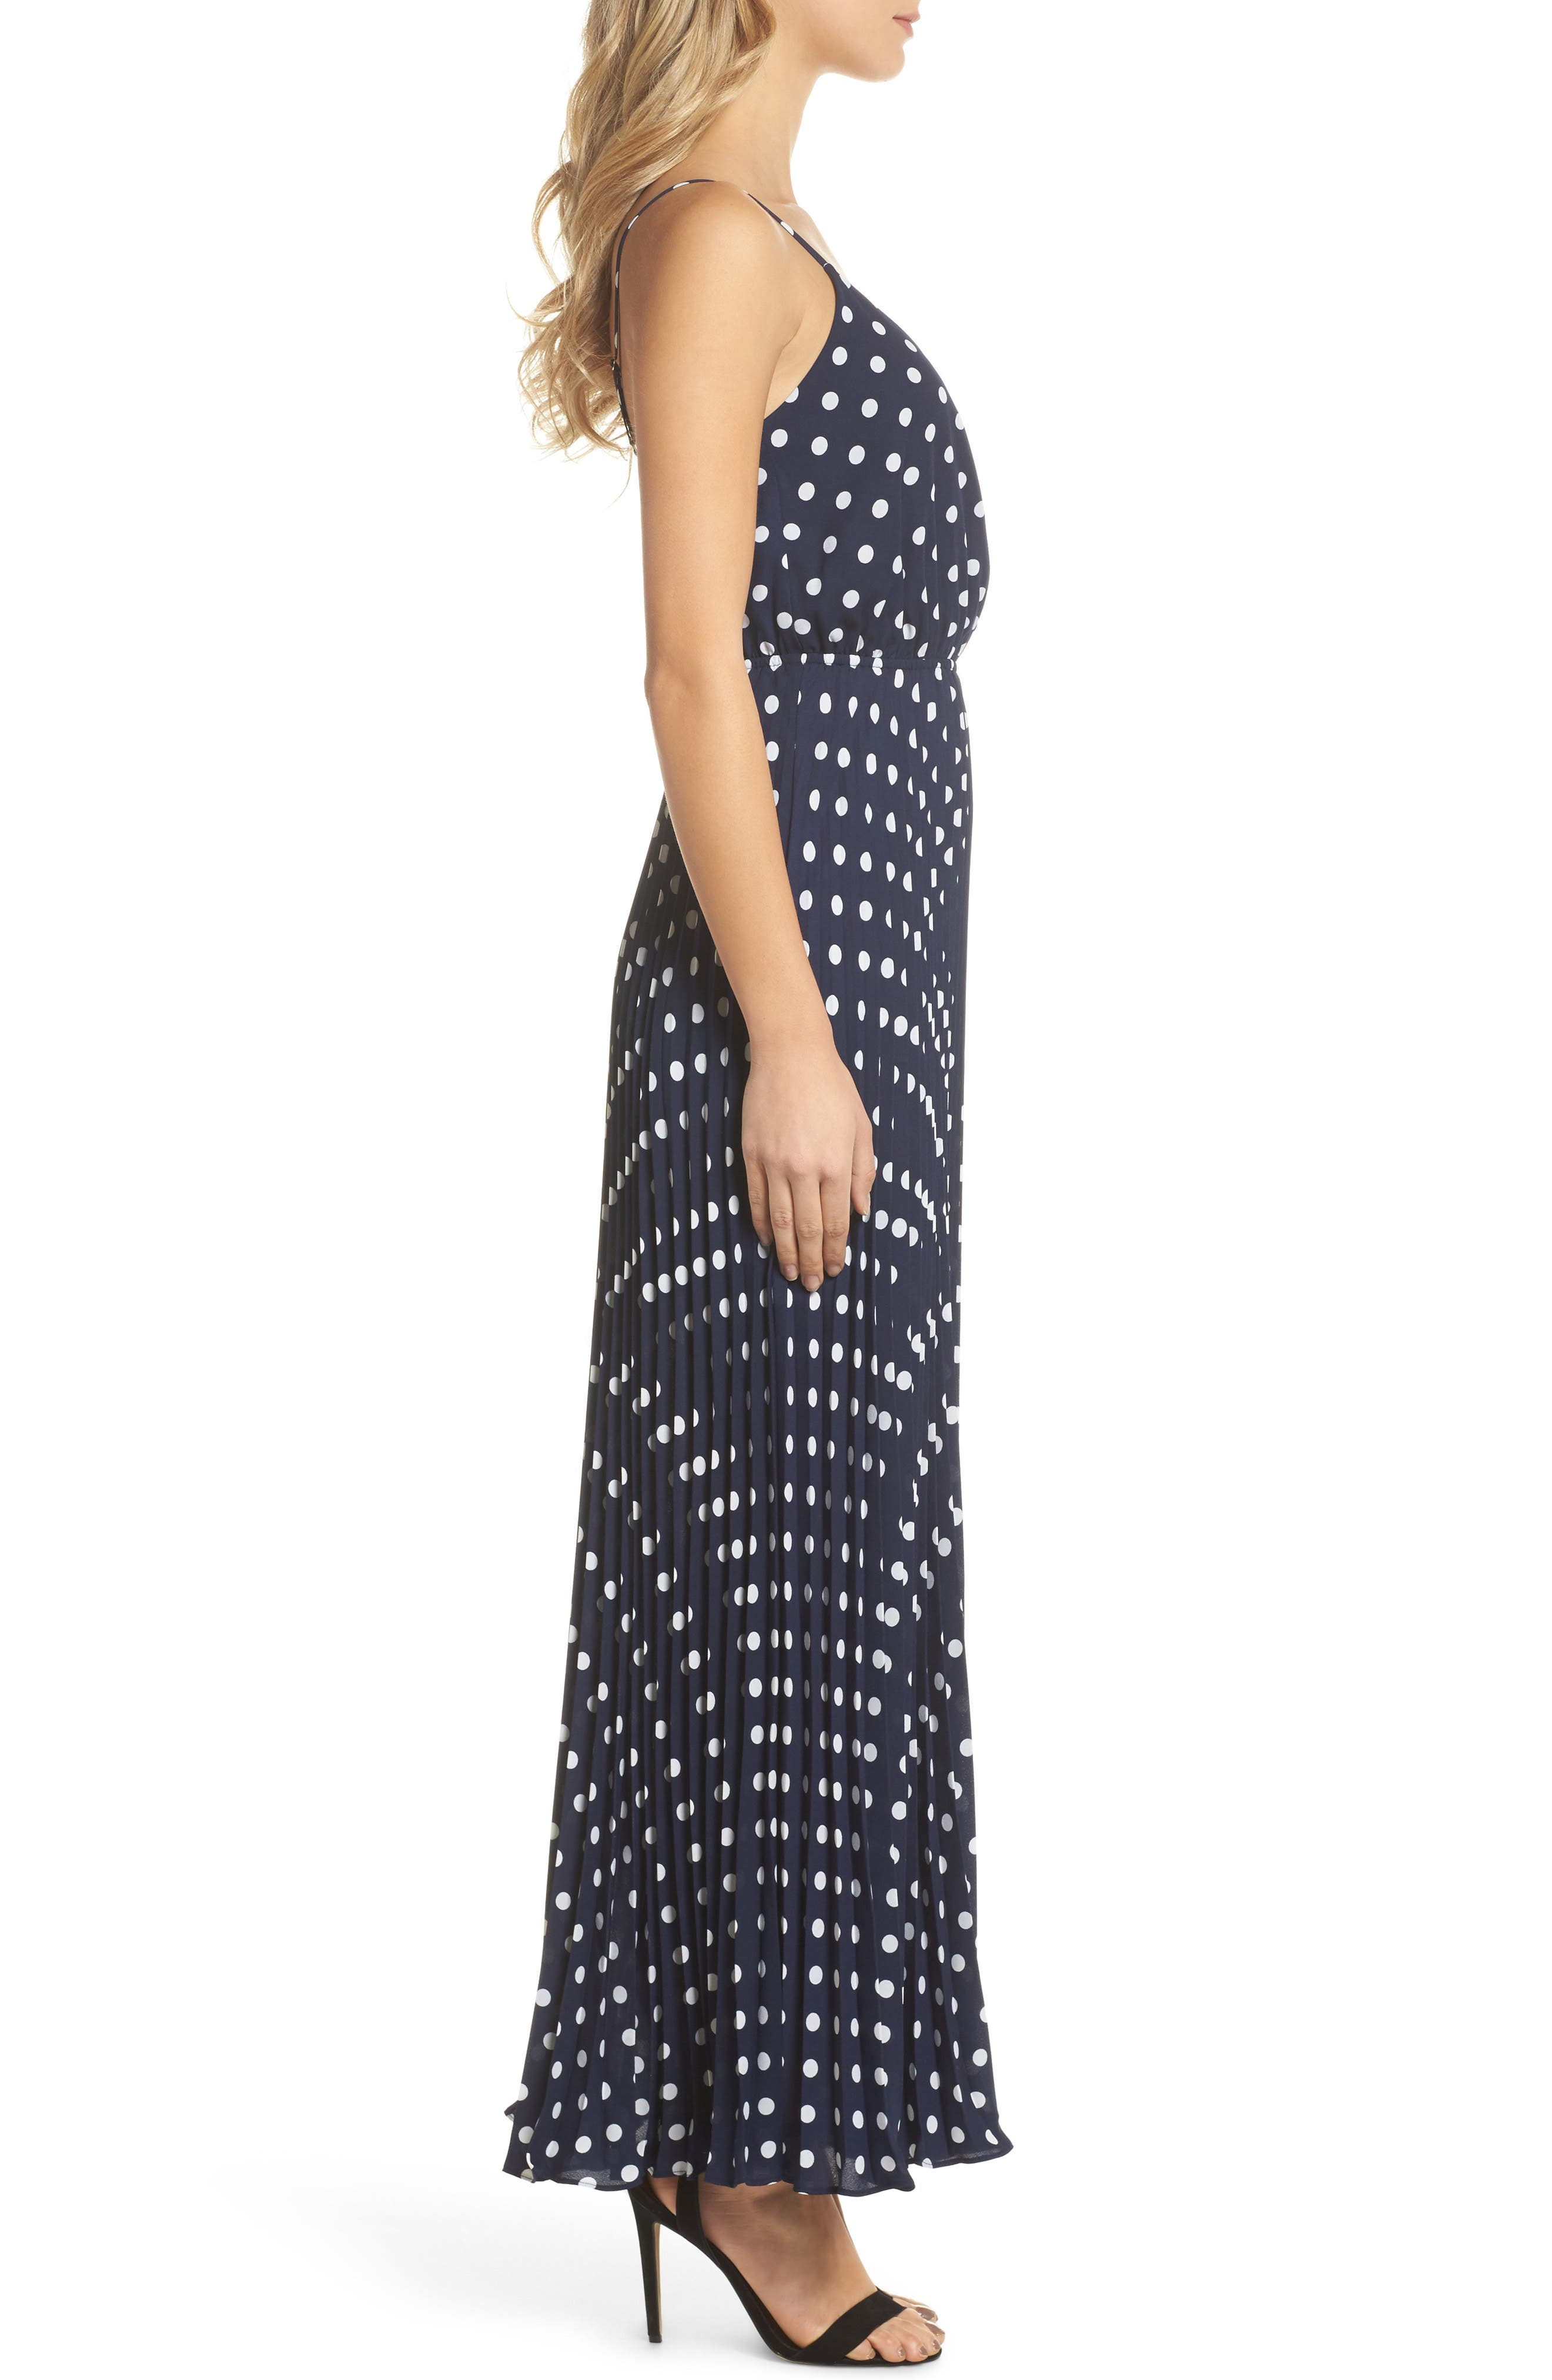 Lily Pond Maxi Dress,                             Alternate thumbnail 4, color,                             Navy Polka Dot